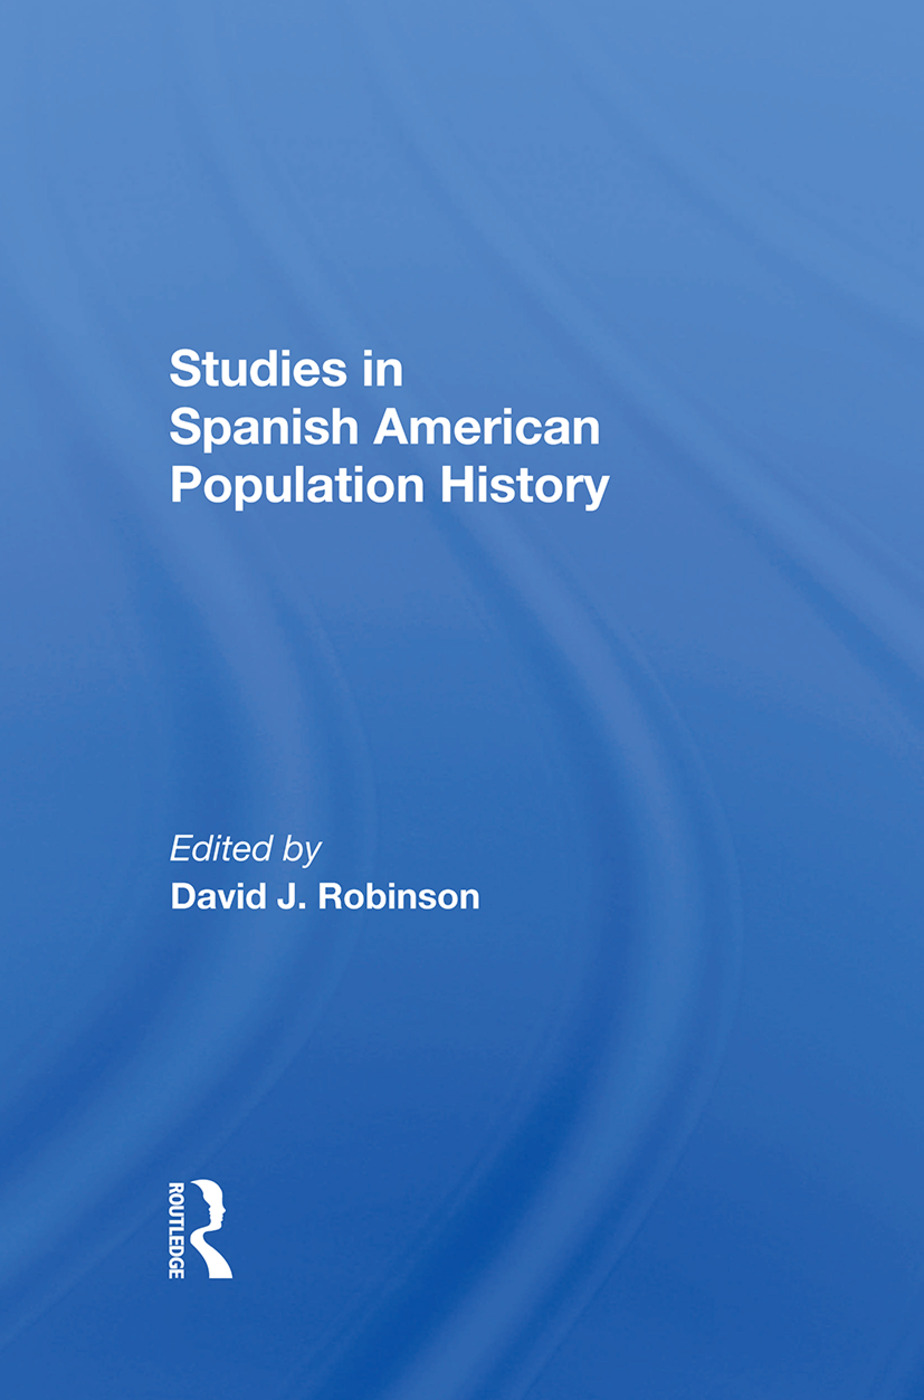 Studies In Spanishamerican Population History: 1st Edition (Hardback) book cover